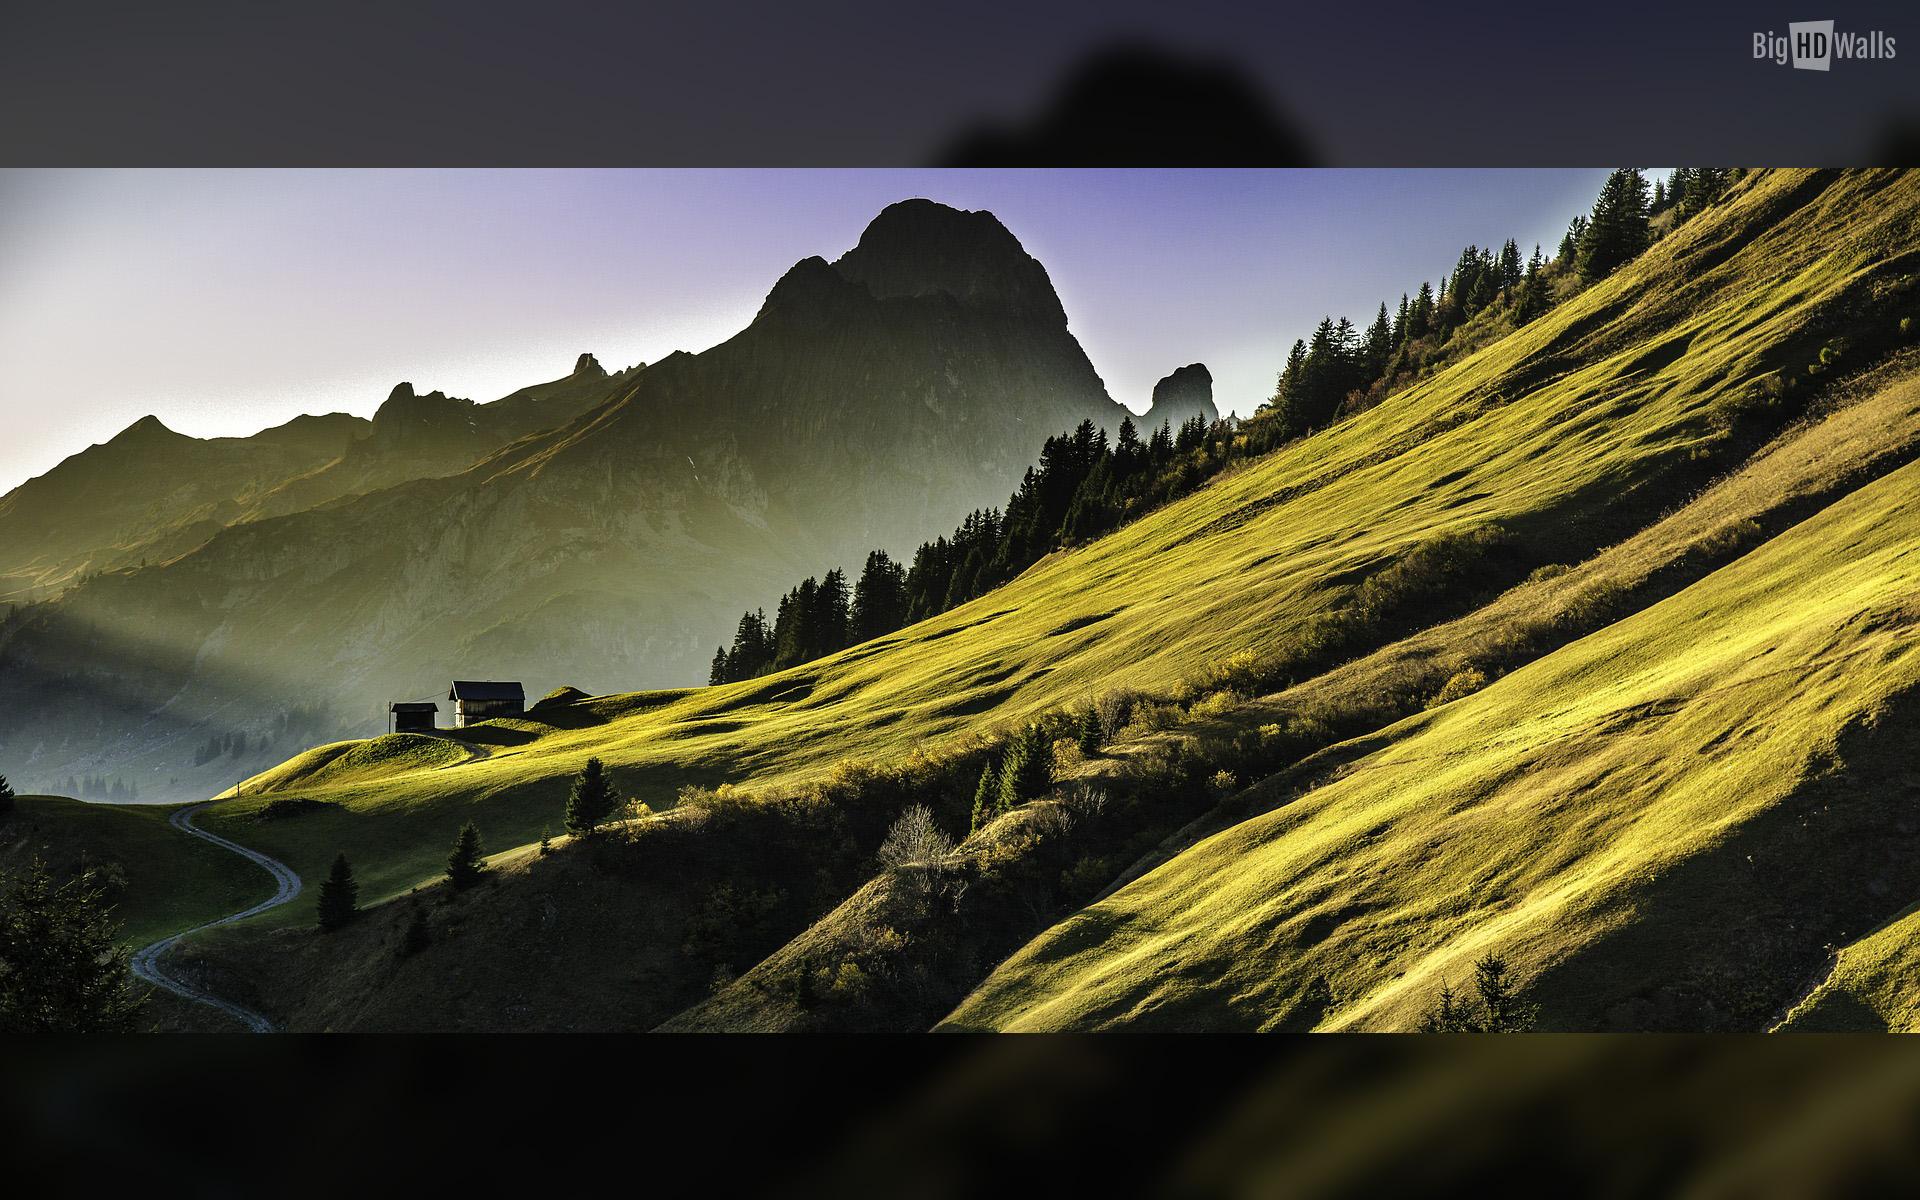 Mountain Landscape HD Wallpaper | BigHDWalls